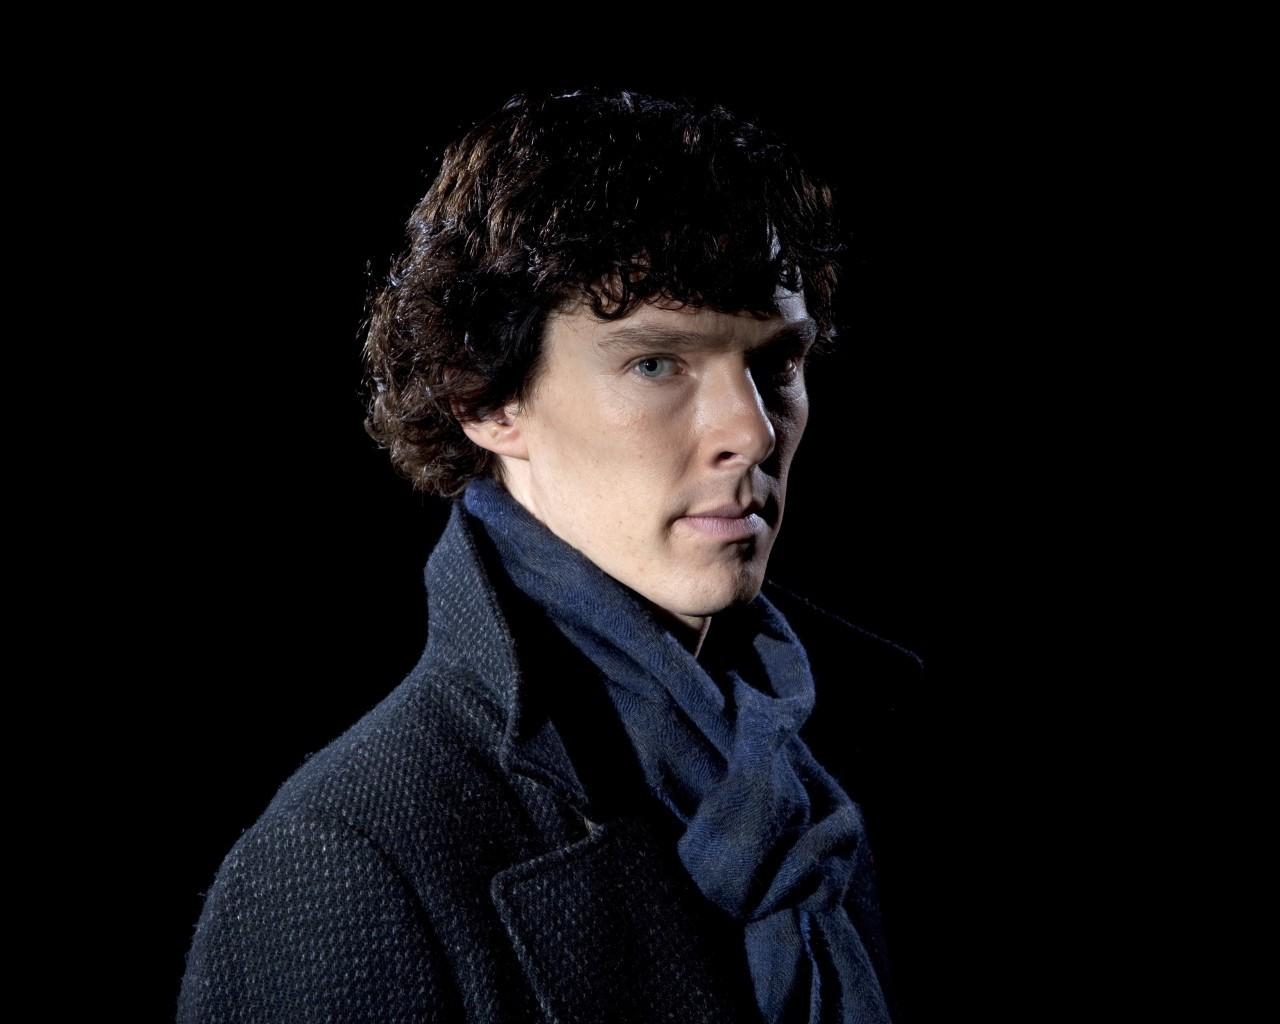 18360 download wallpaper Cinema, People, Actors, Men, Sherlock, Benedict Cumberbatch screensavers and pictures for free